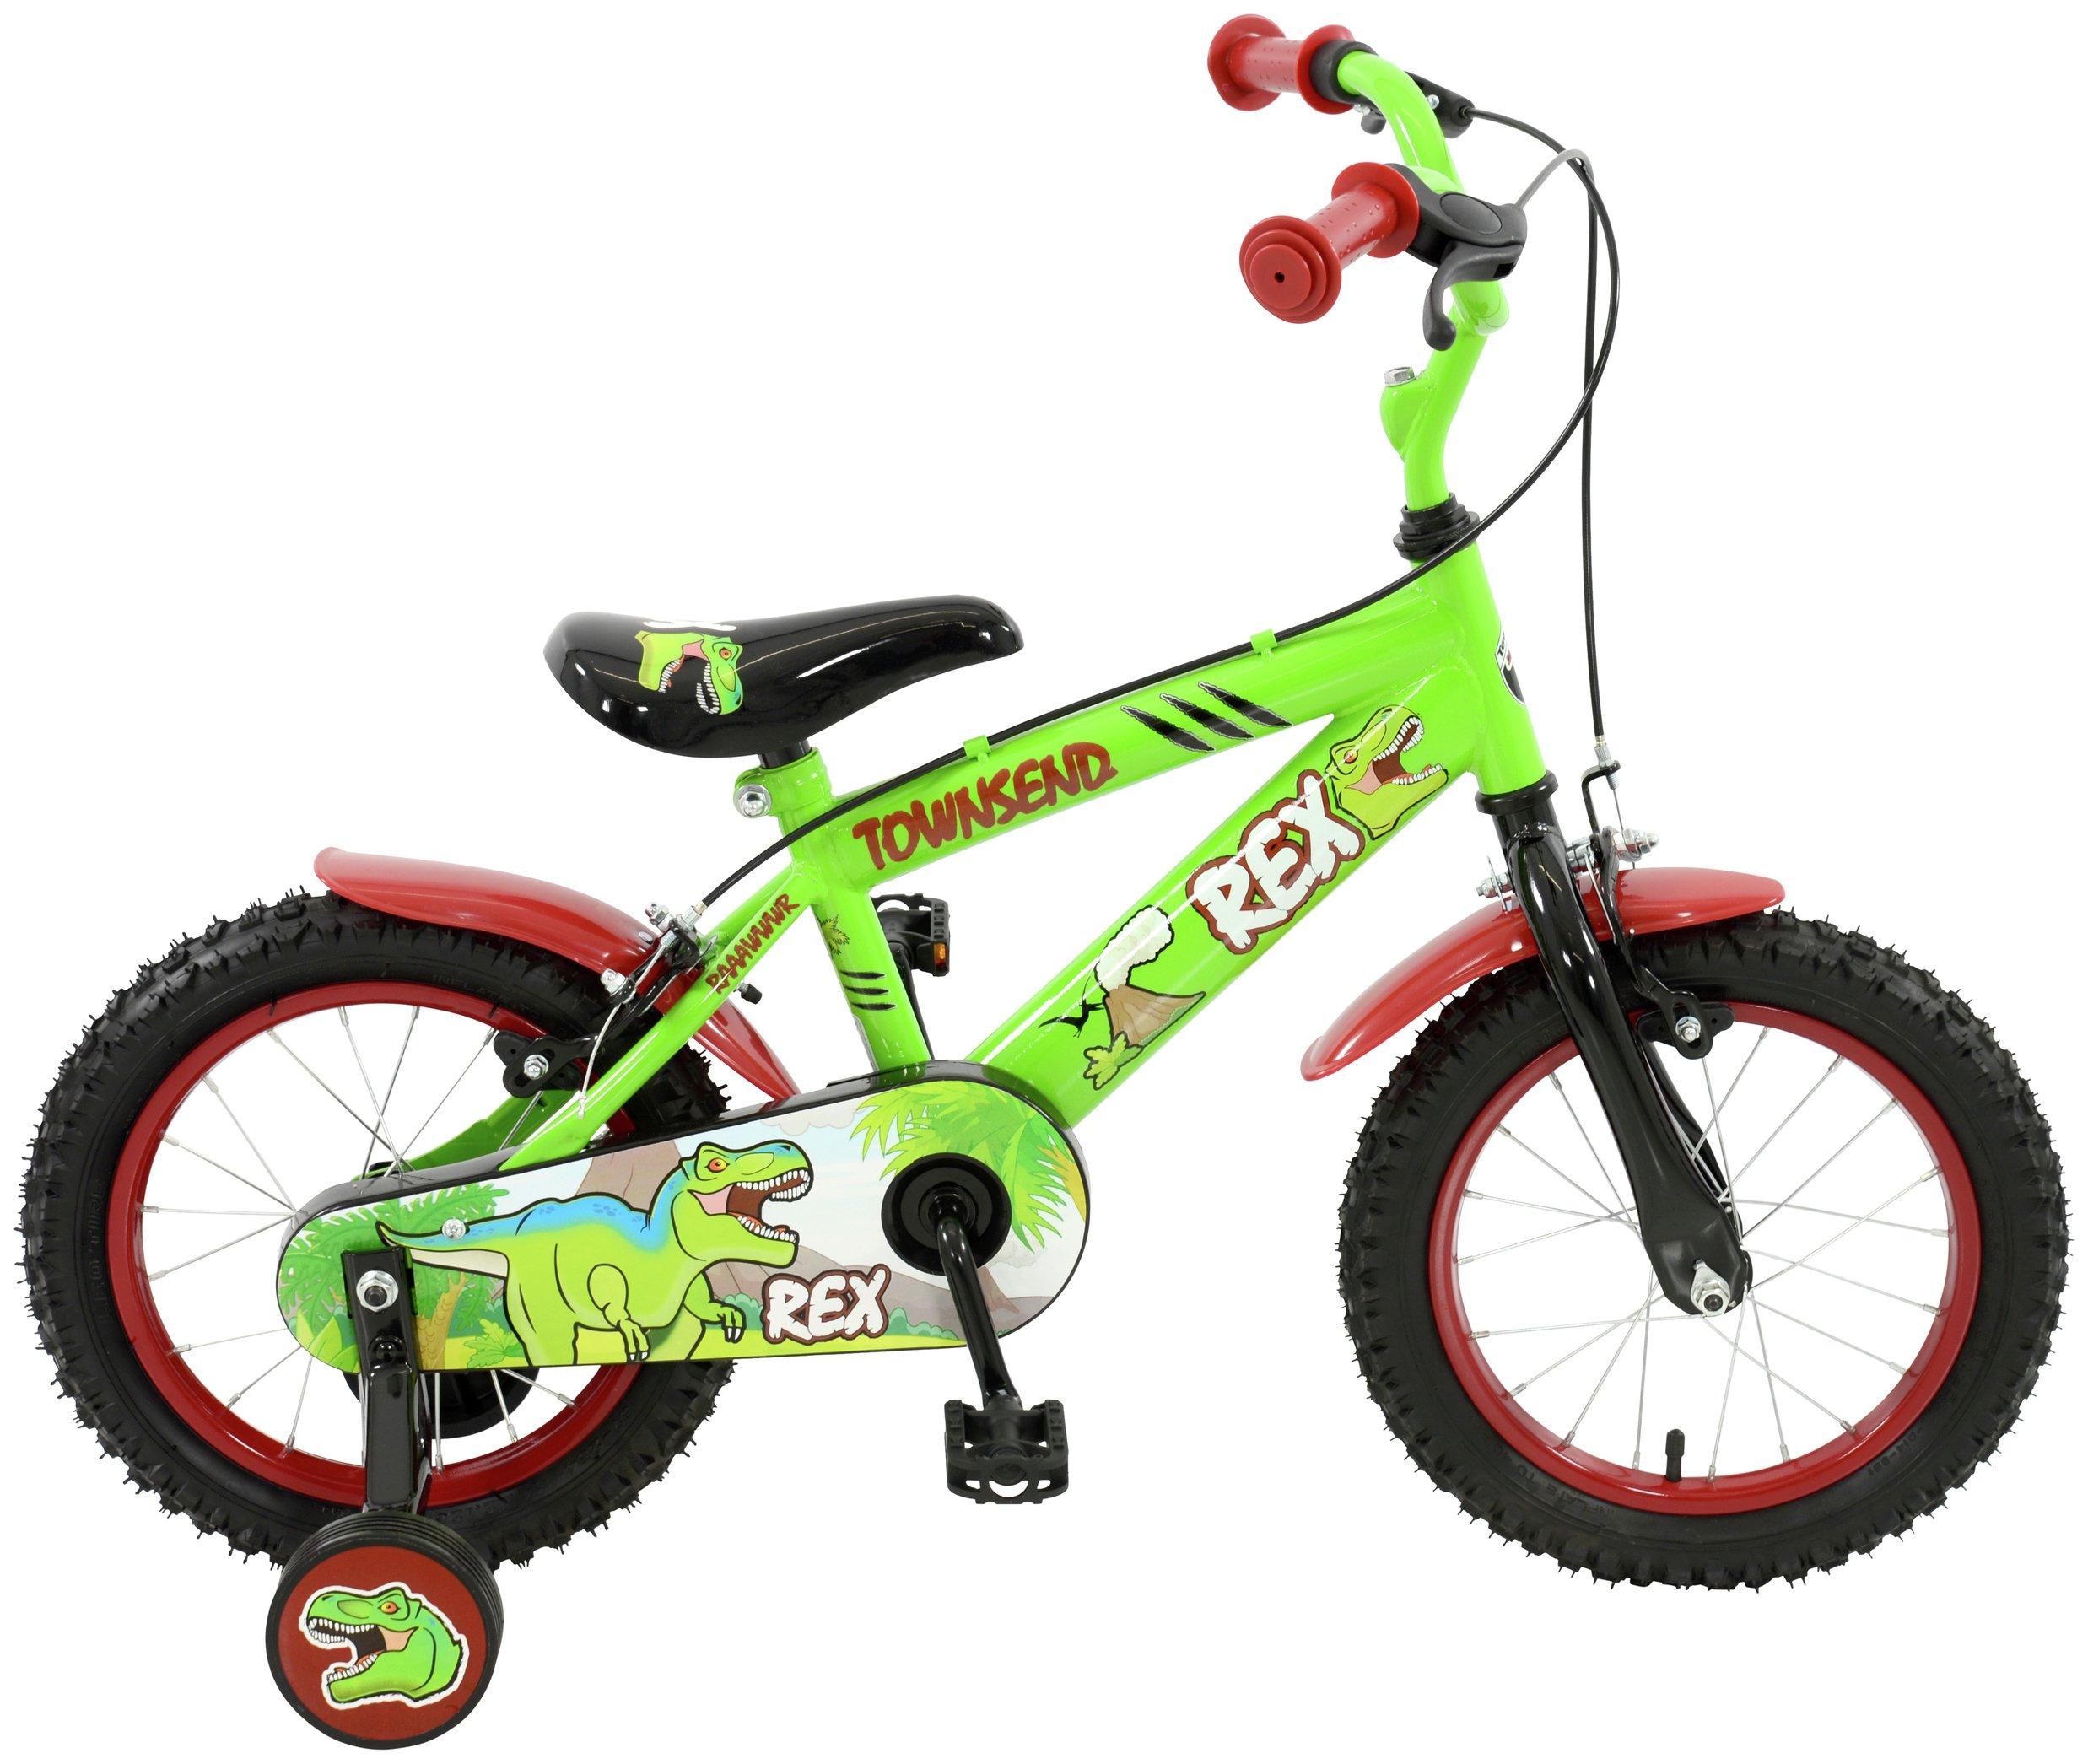 Townsend Rex Kids 14 Inch Bike